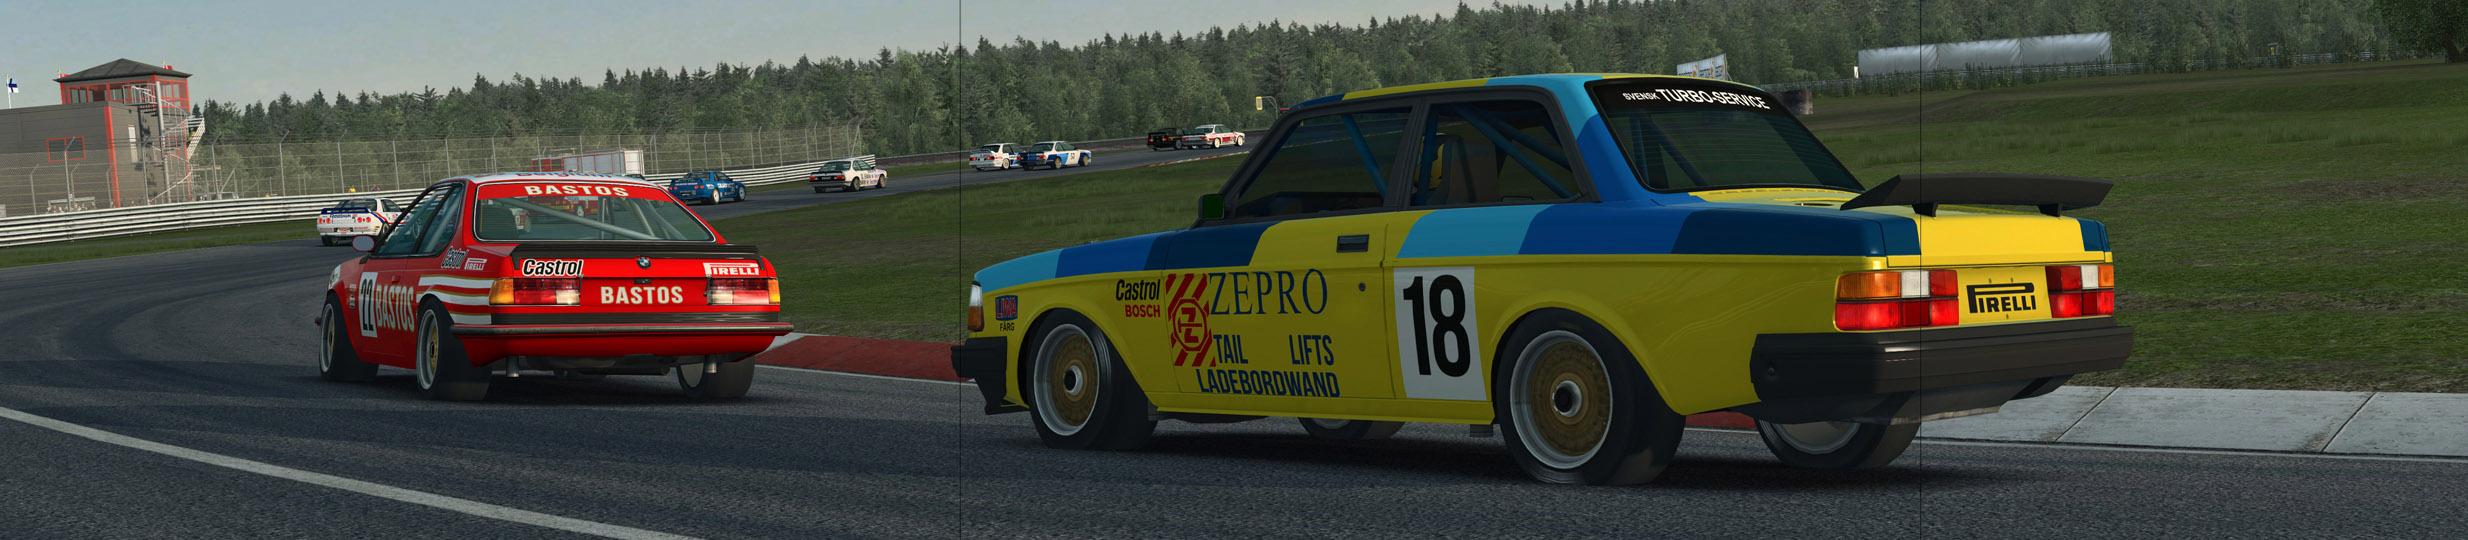 2 RACEROOM VOLVO 240 TURBO at SCANDIAVIAN RACEWAY crop copy.jpg